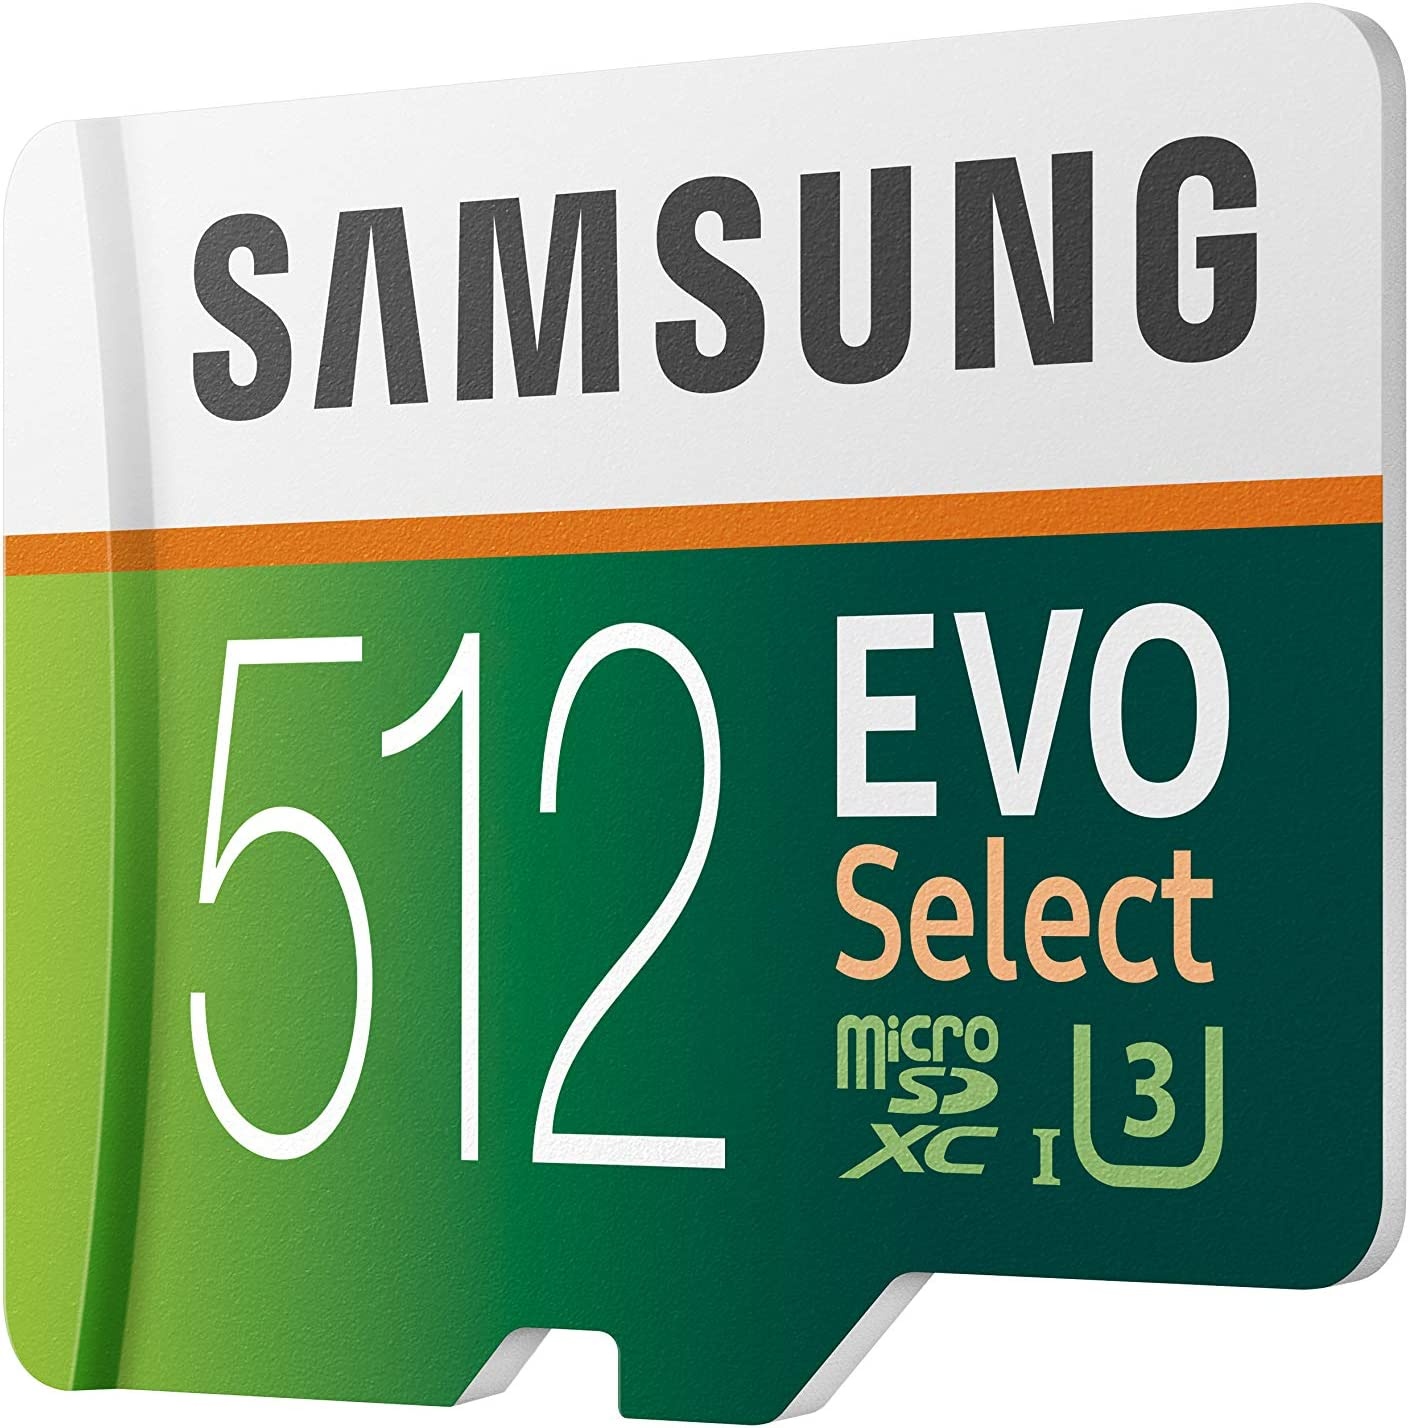 Samsung Evo Select 512 Gb Microsd 100mb Computer Zubehör